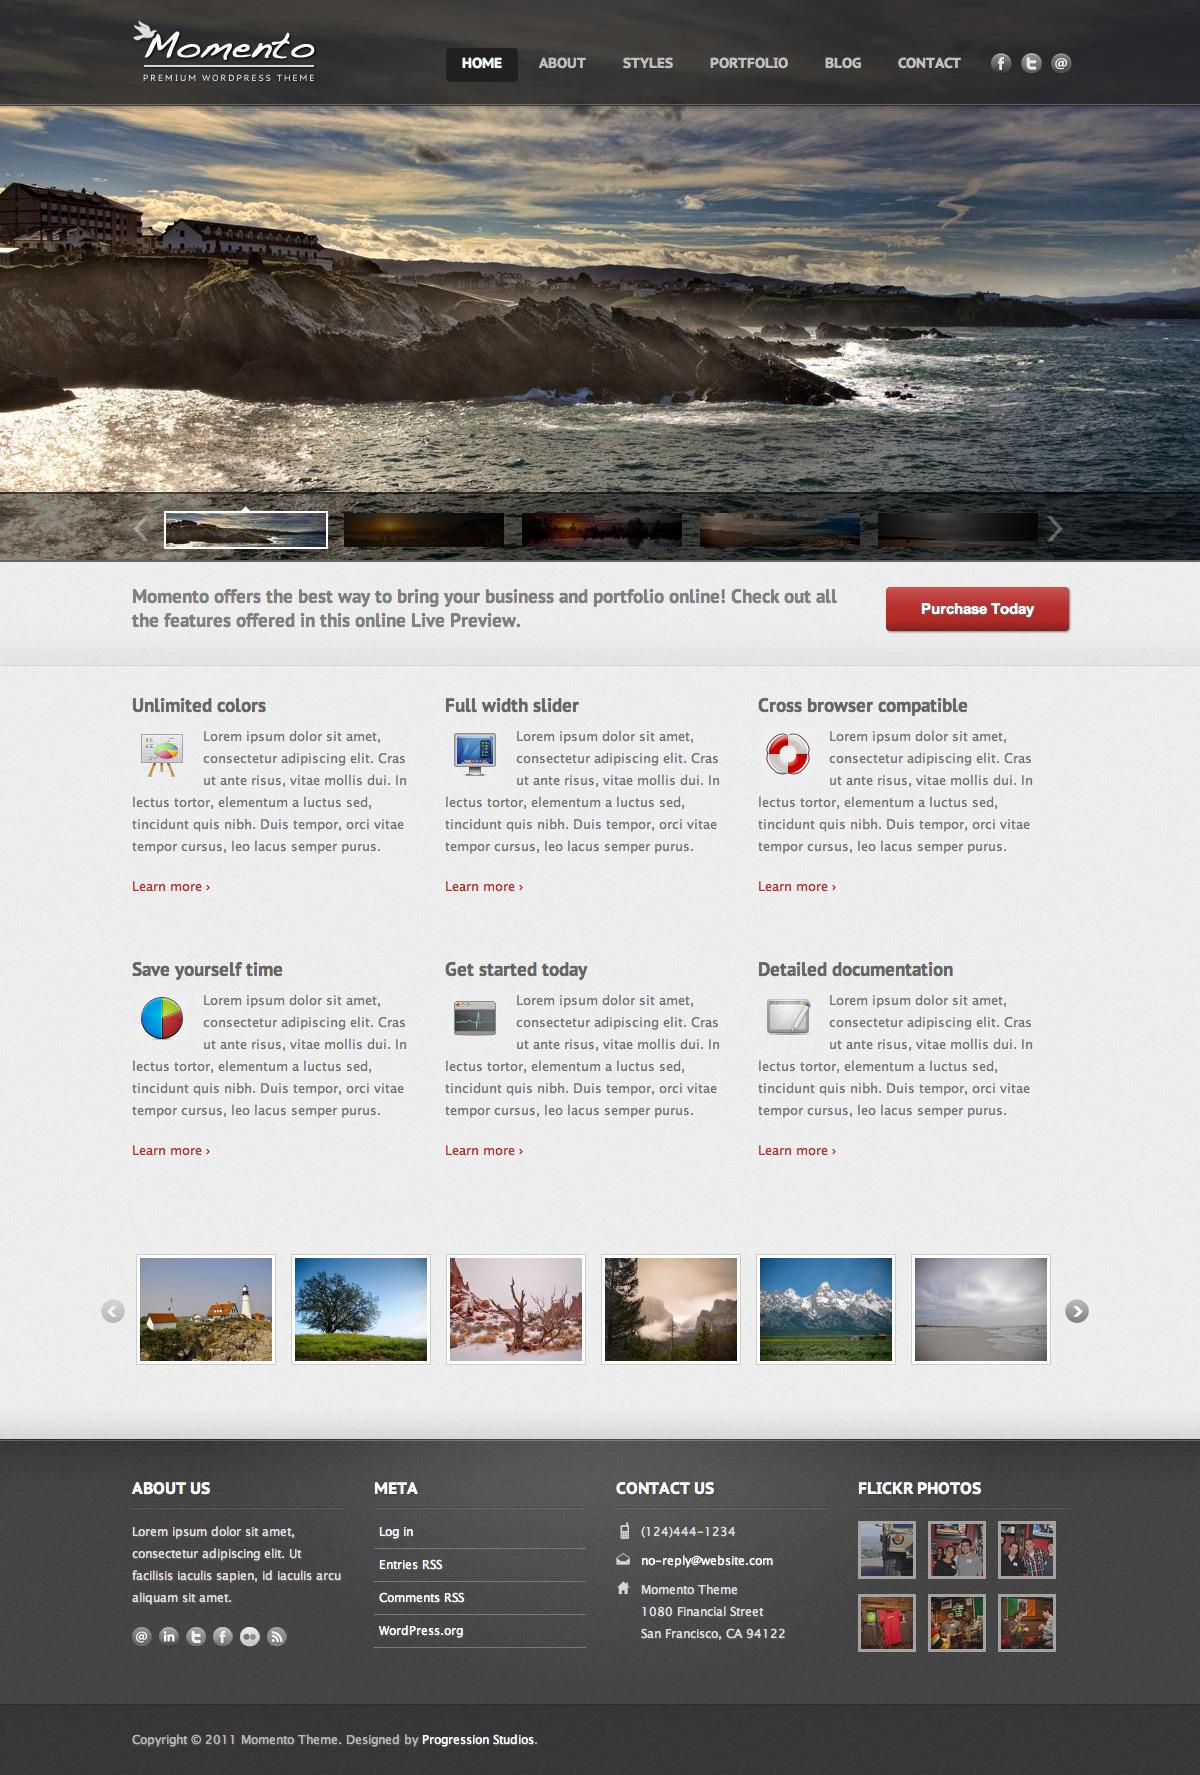 http://2.s3.envato.com/files/36161826/Screenshots/1-Momento-Index.jpg